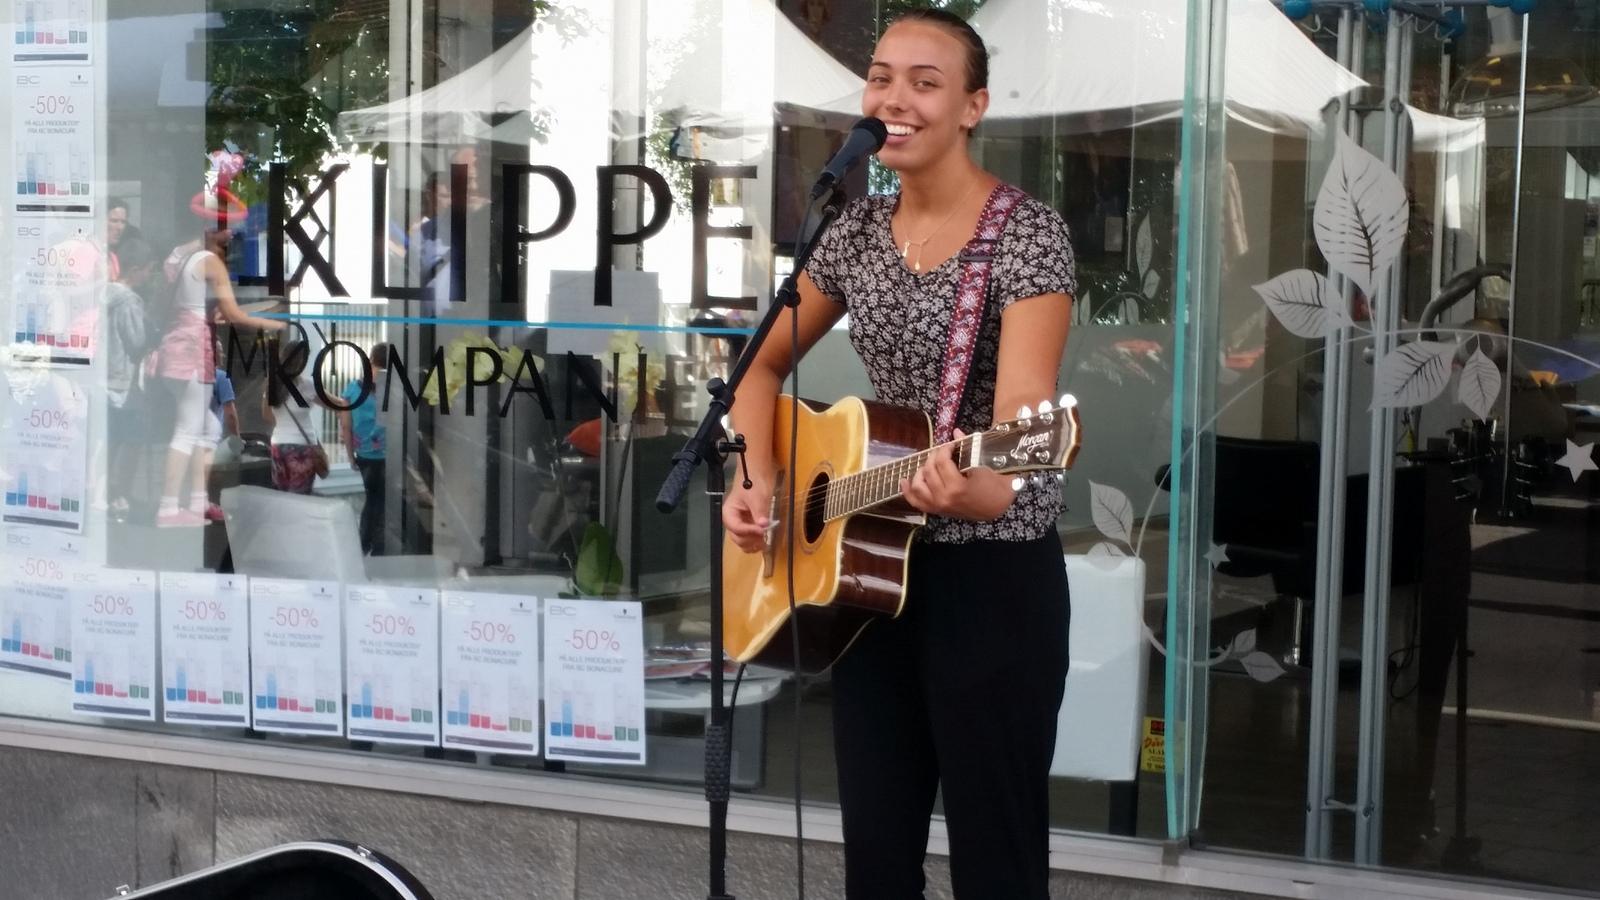 Spre sang og glede. Foto: Ole Foss